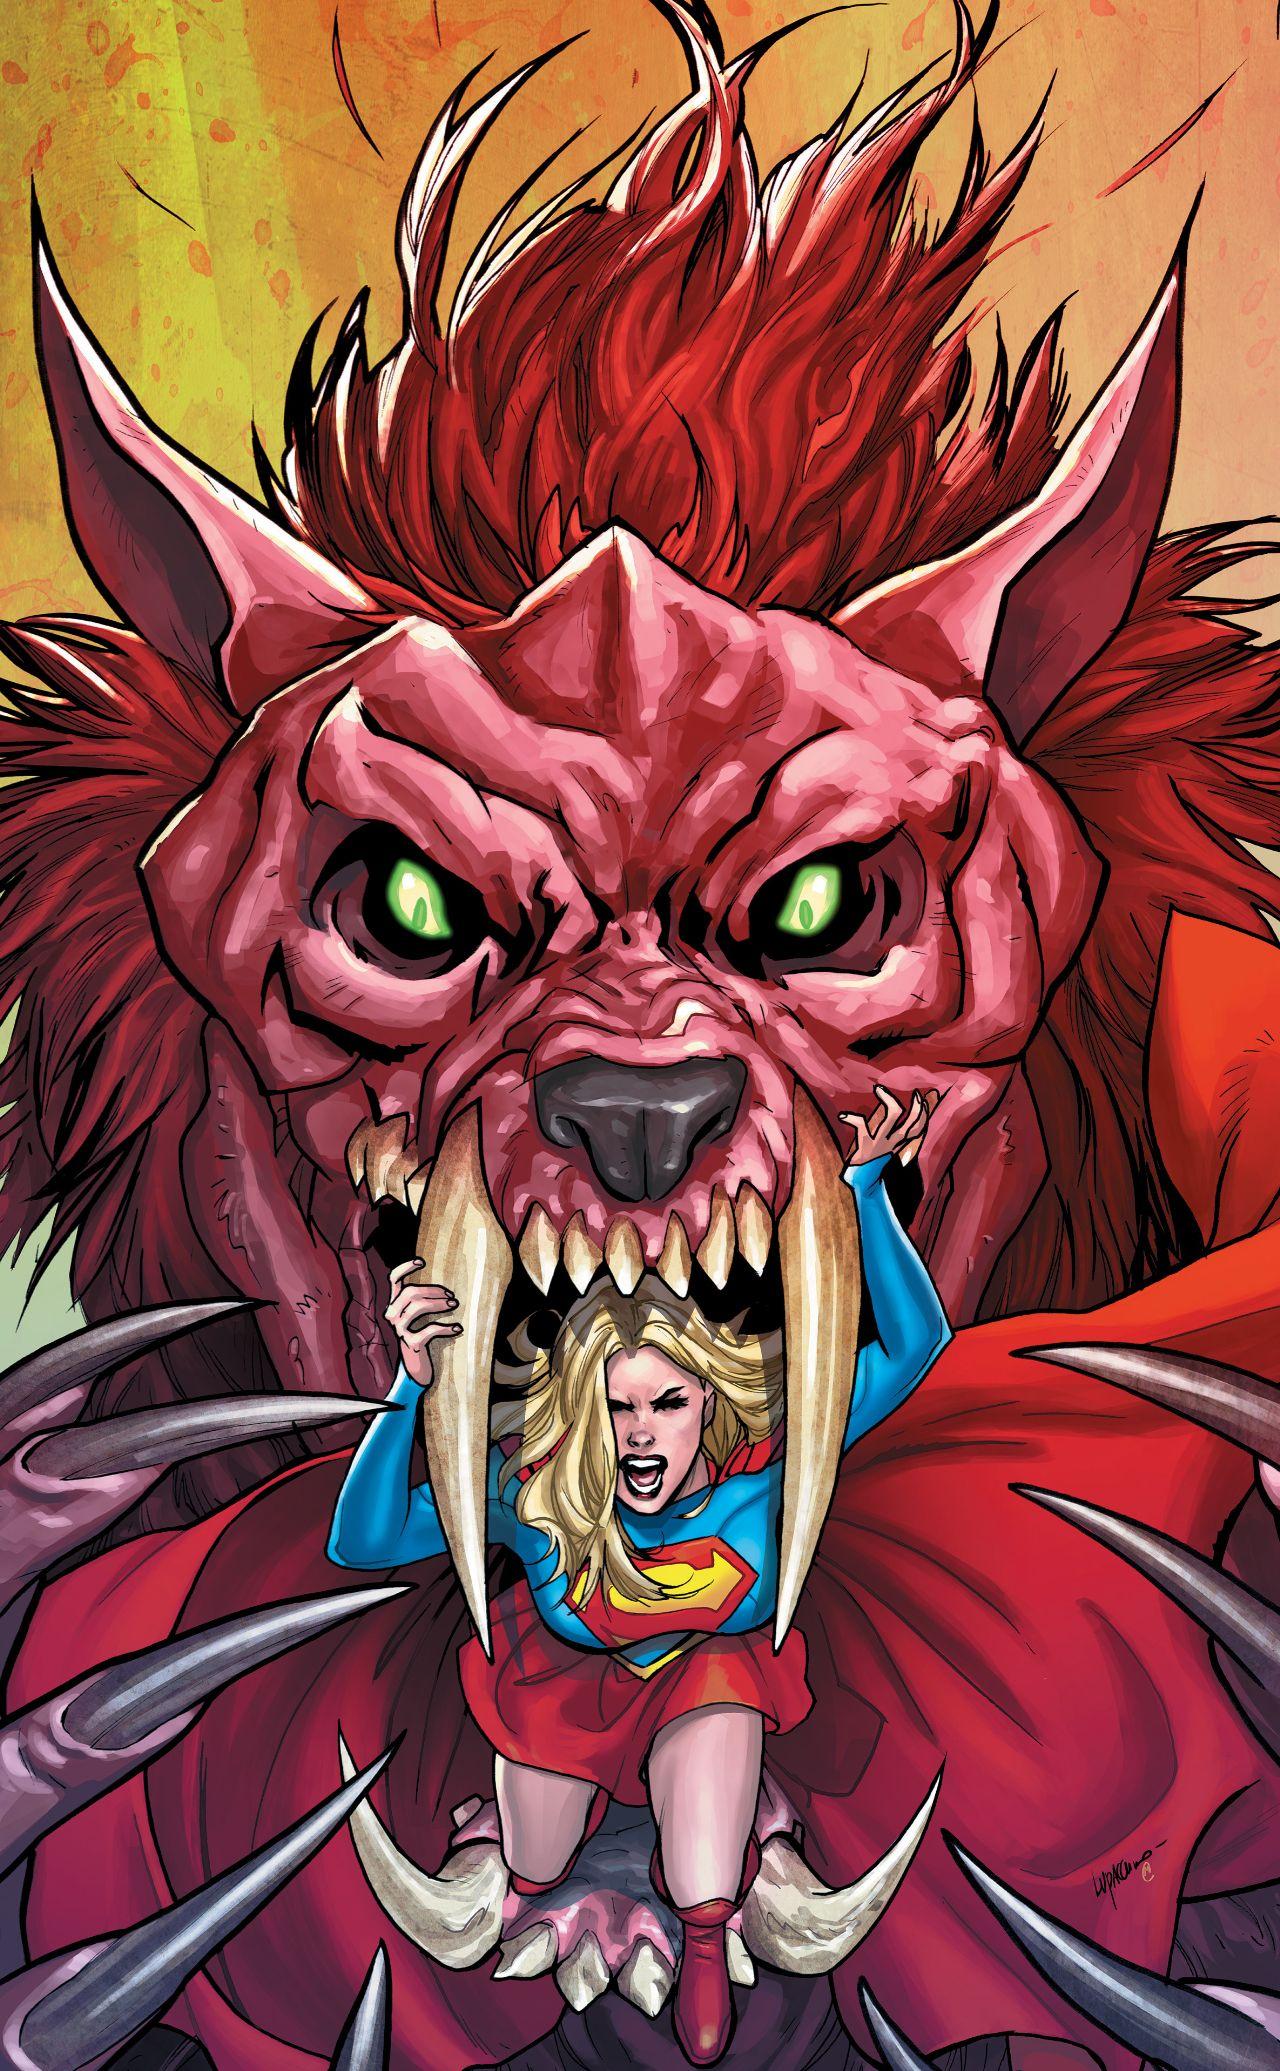 Supergirl Vol 7 7 Textless.jpg